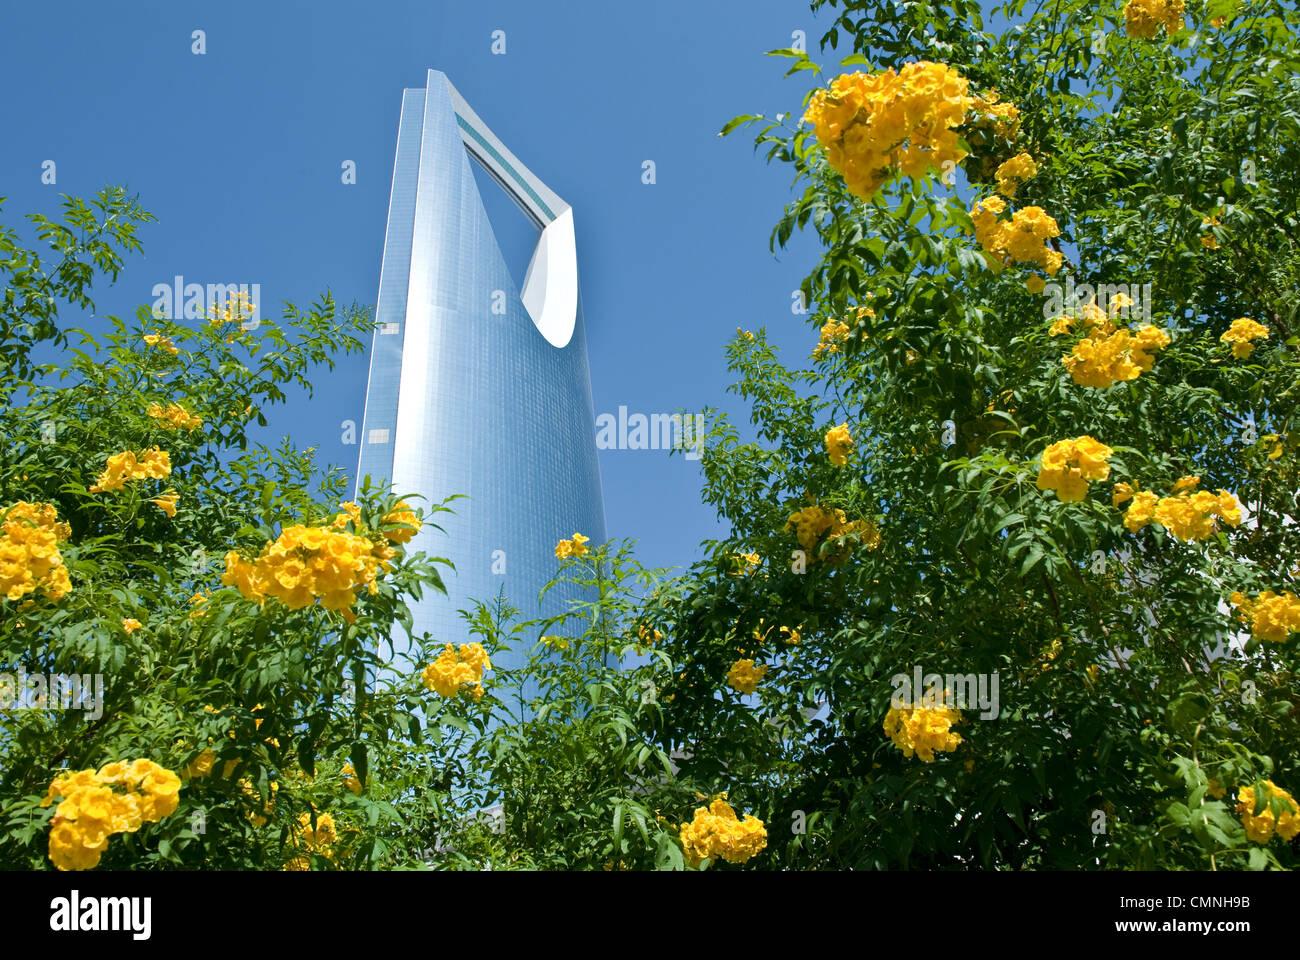 Asia Arabia Saudita Riad el Reino arquitectónico torre Imagen De Stock